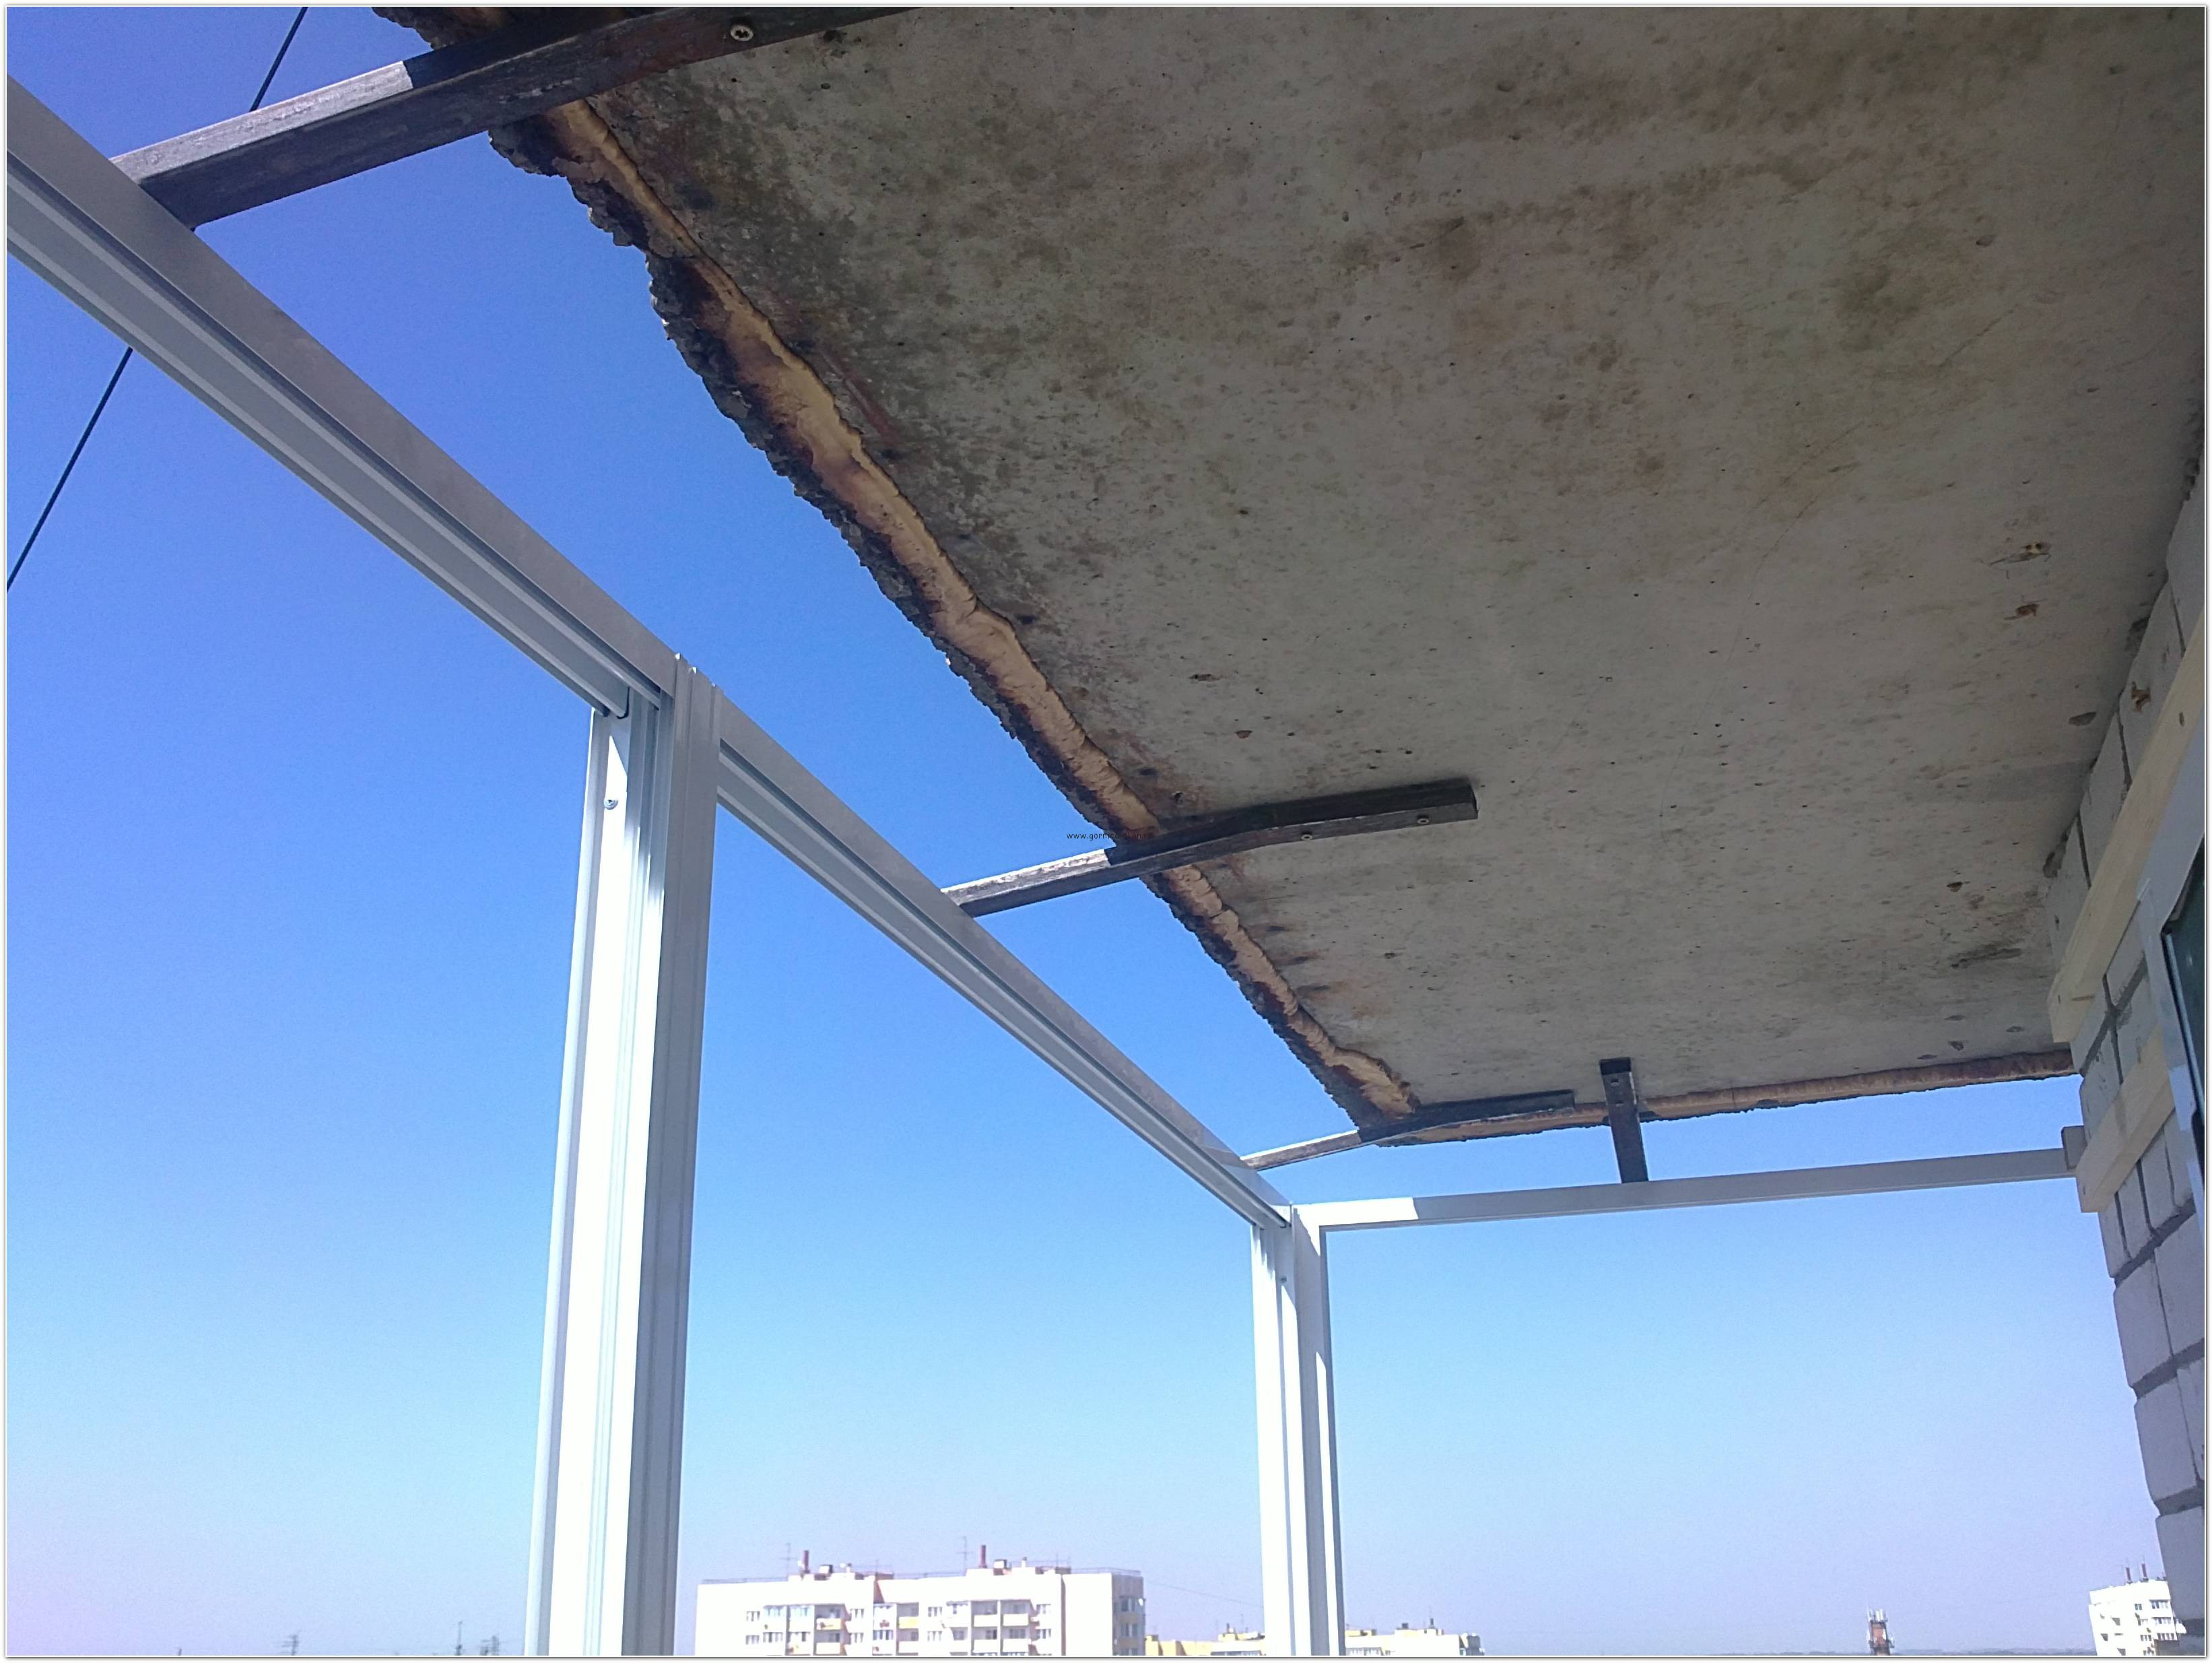 Отделка и утепление лоджии, балкона: видео-инструкция по мон.